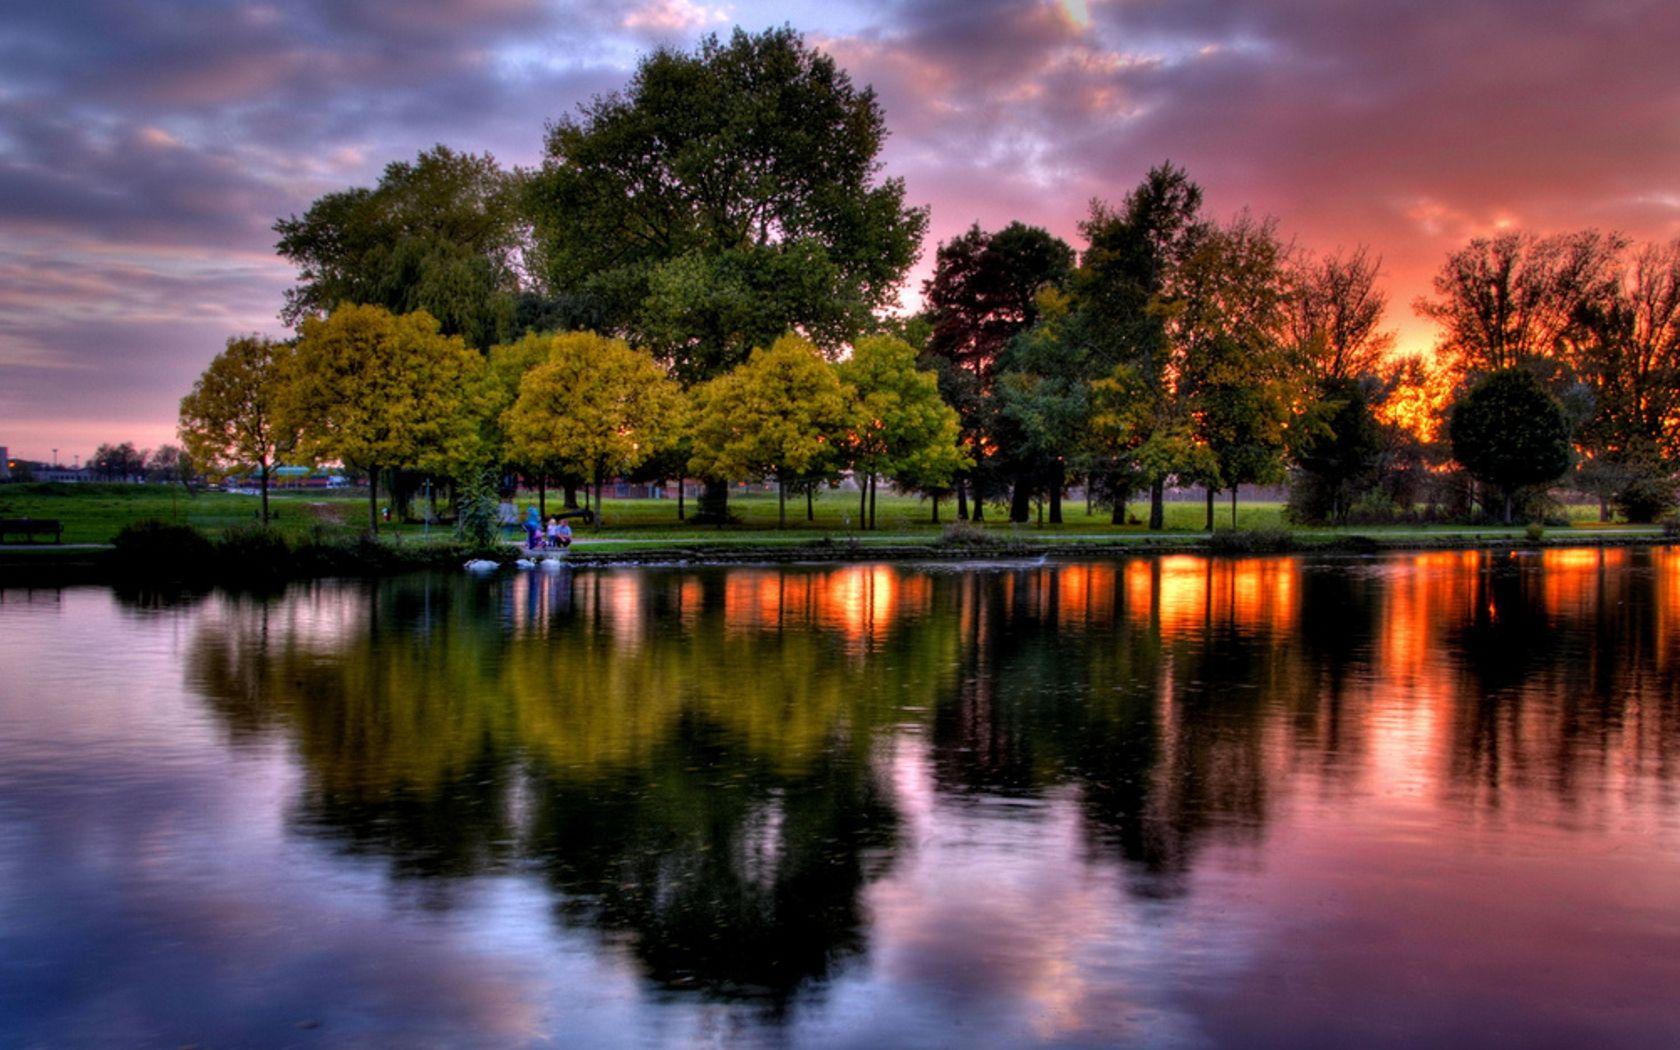 Peaceful Landscapes Landscape Nature Peaceful People Reflection Sky Sunset Tree Landscape Nature Sunset Nature